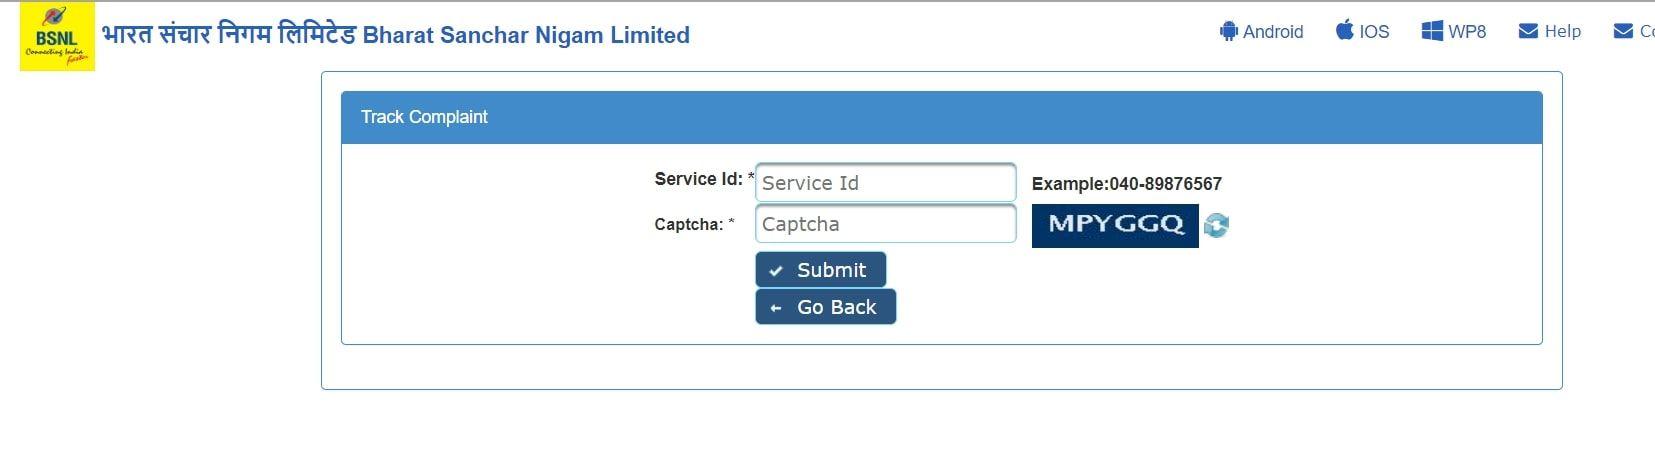 BSNL Selfcare portal track status